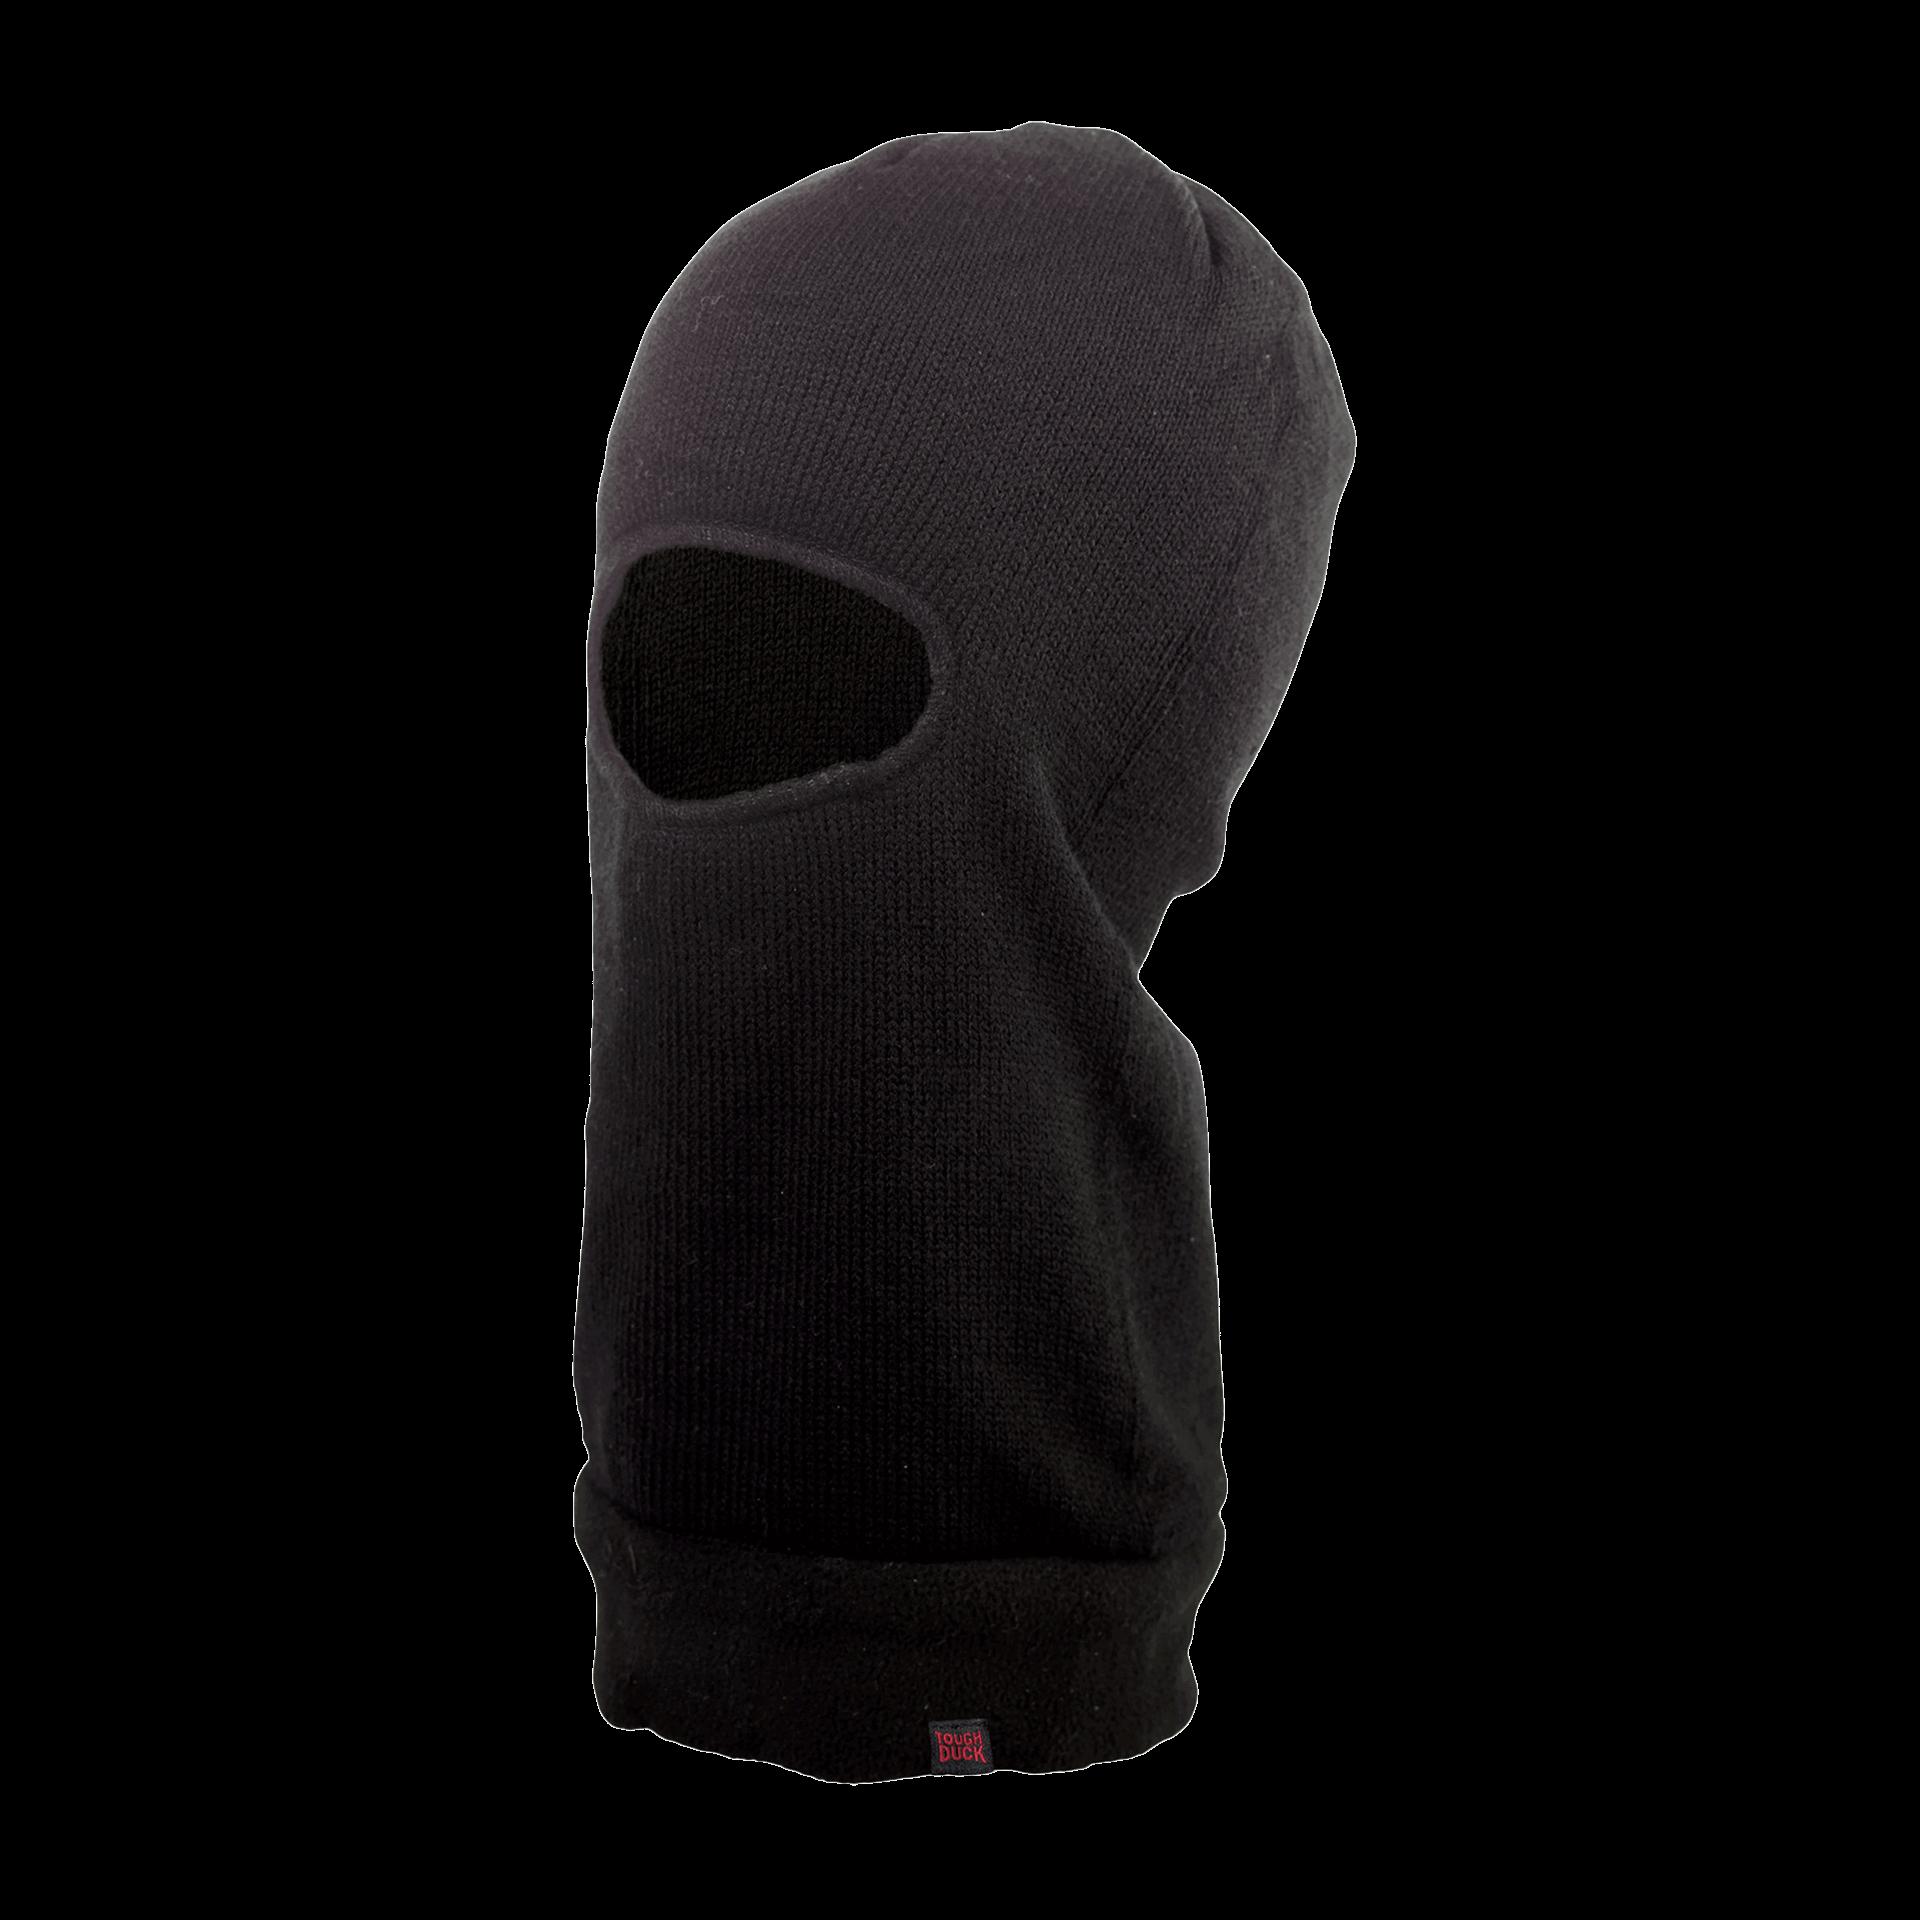 Tough Duck Acrylic Fleece Lined Balaclava (6pk) - i25616